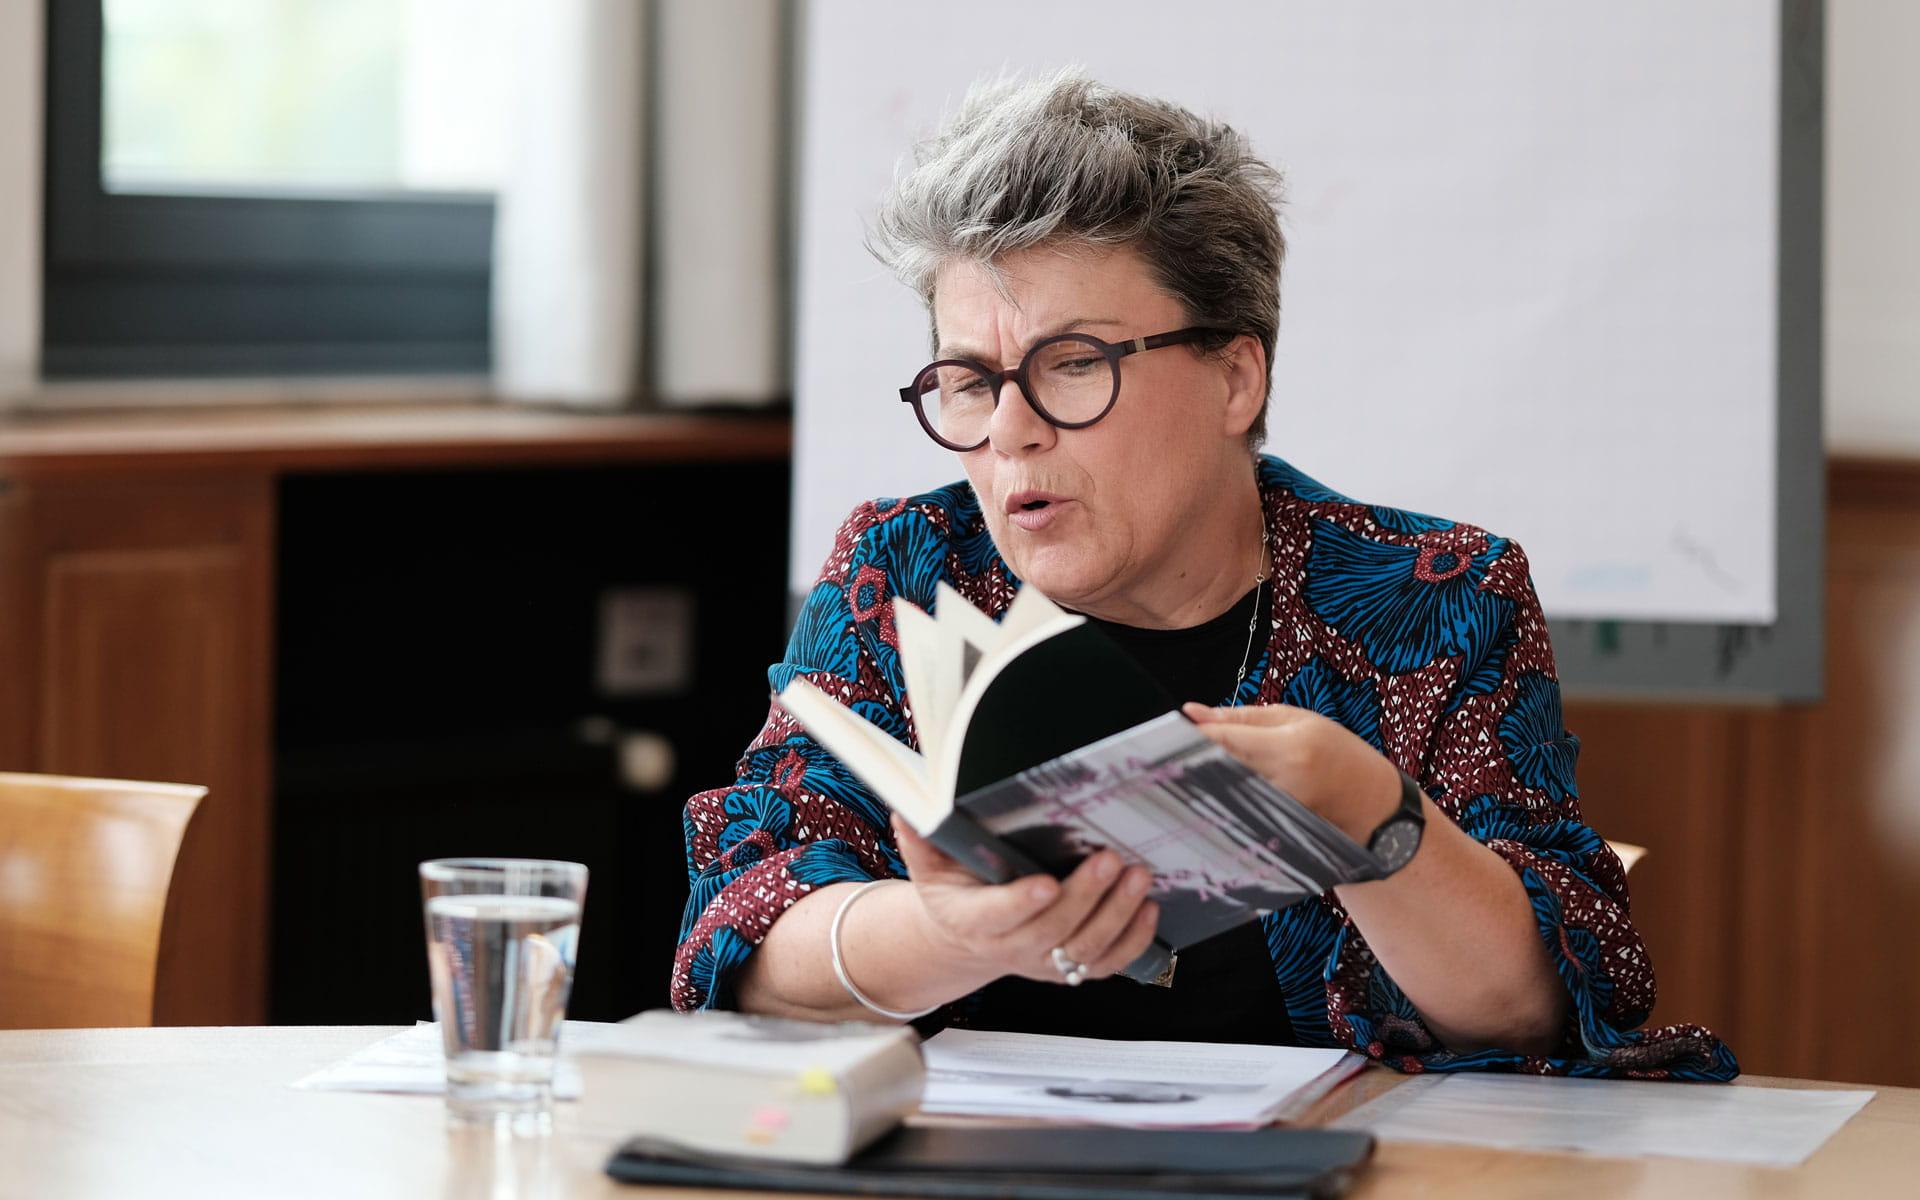 Elisabeth Weller: Lucia Berlins kühne Kurzgeschichten <br/>(c) Sebastian Wenzel